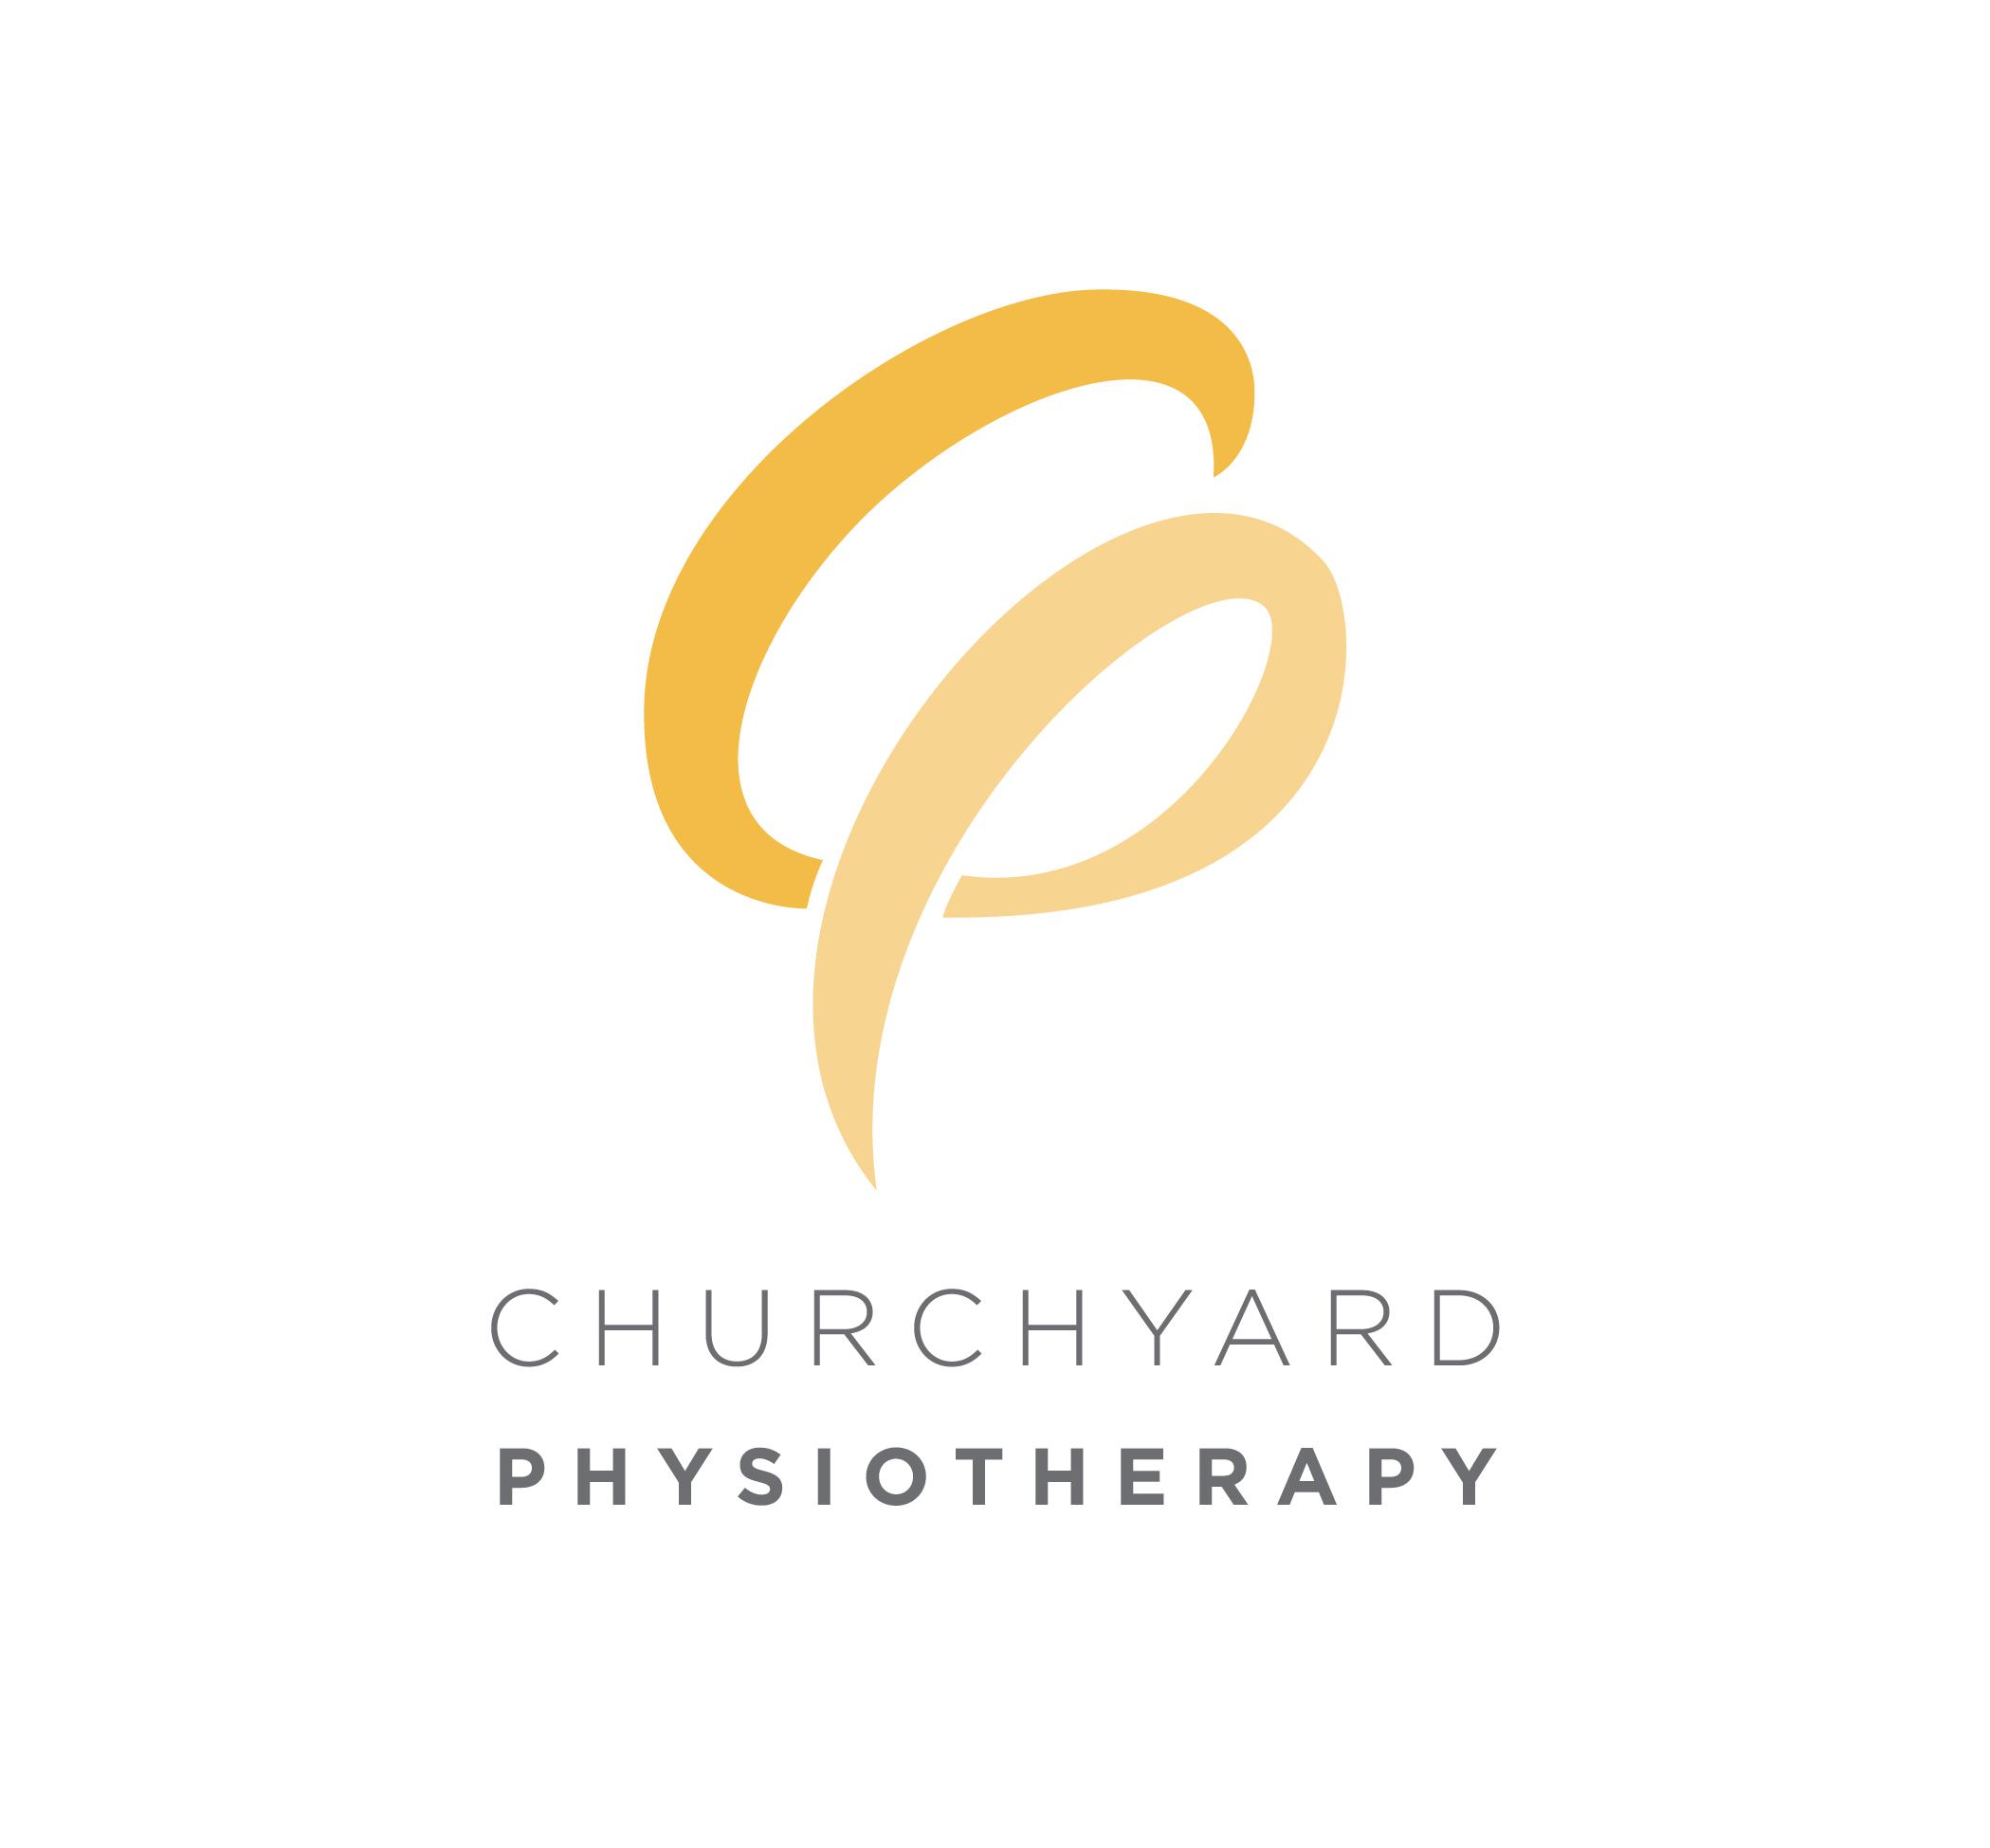 Churchyard Physiotherapy